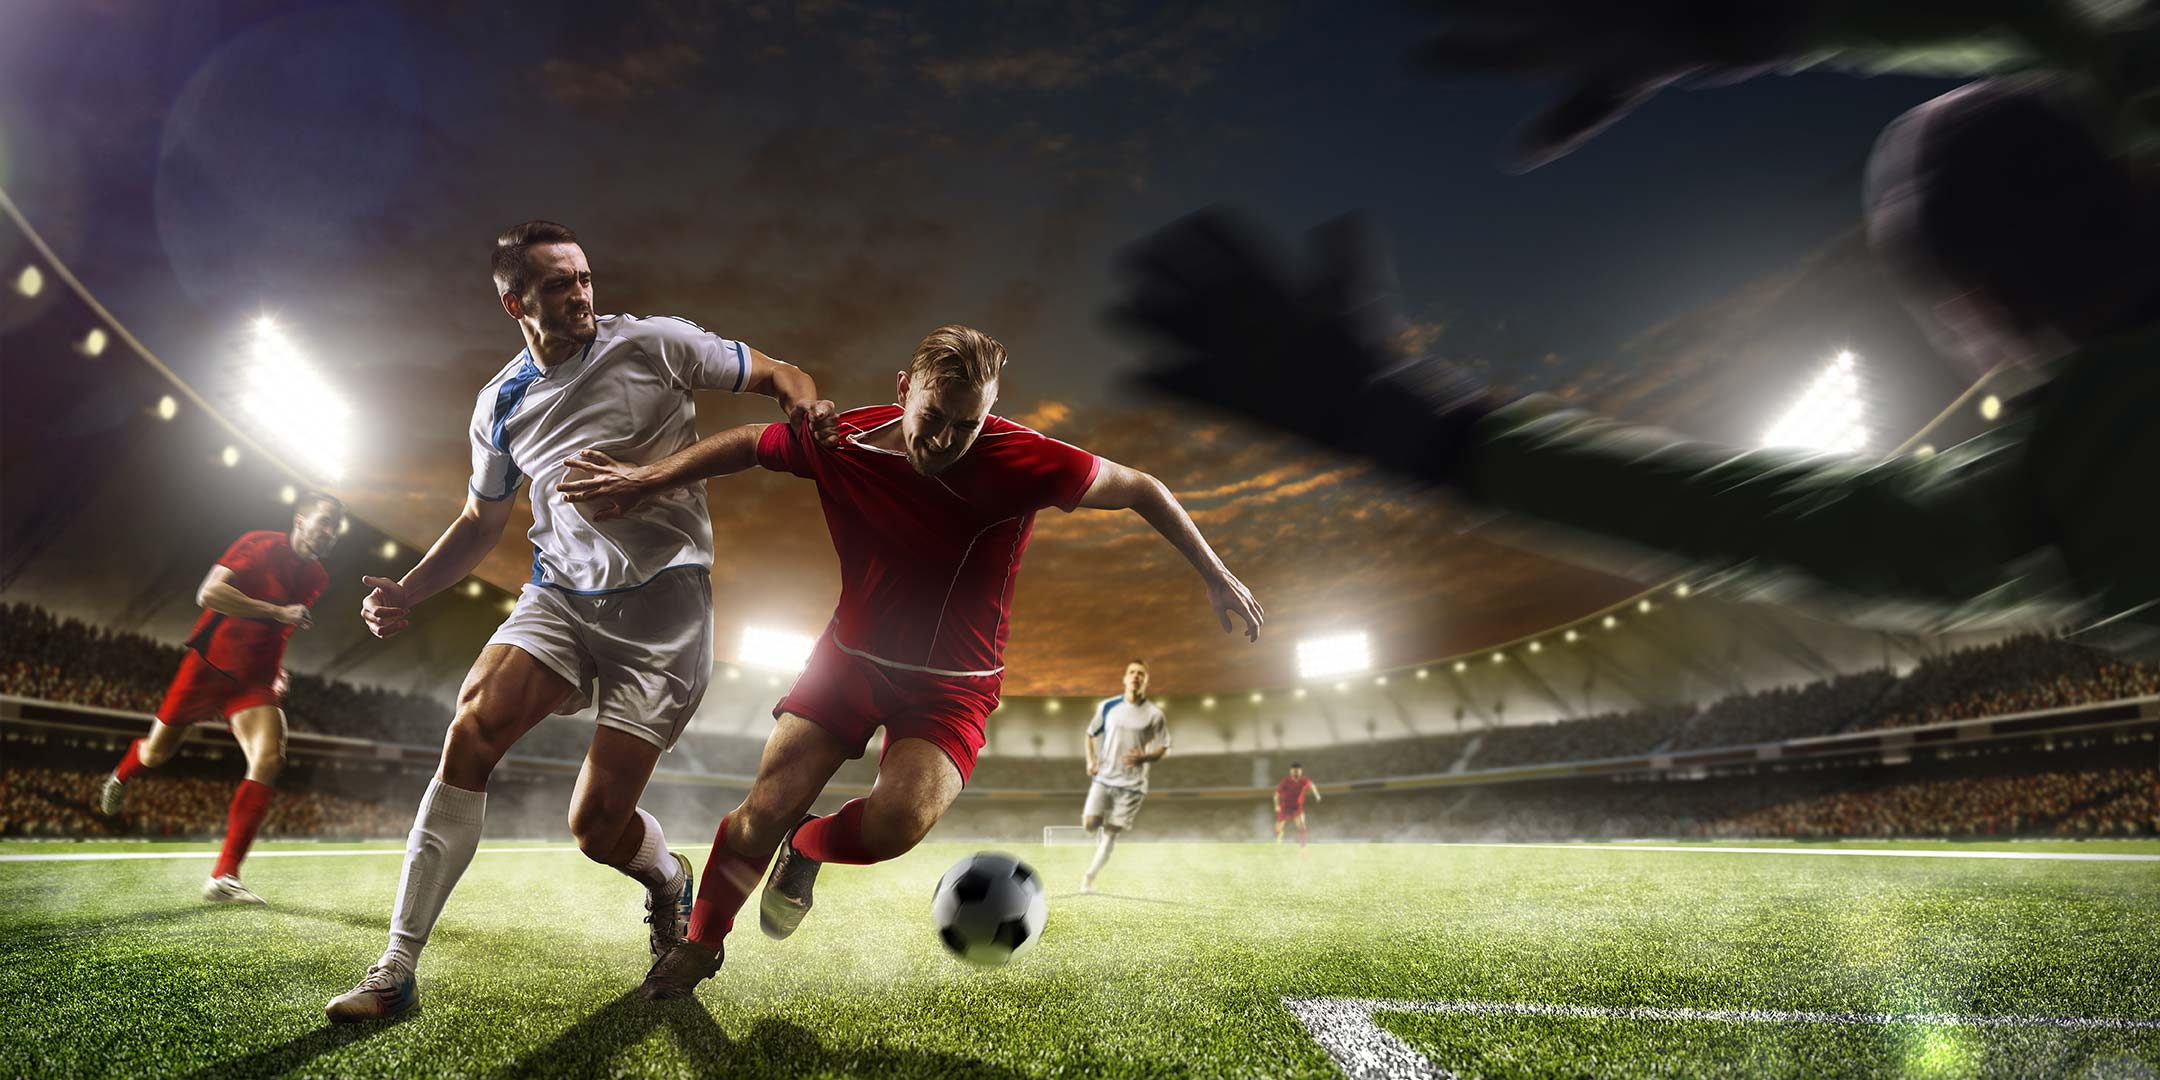 fotboll betting